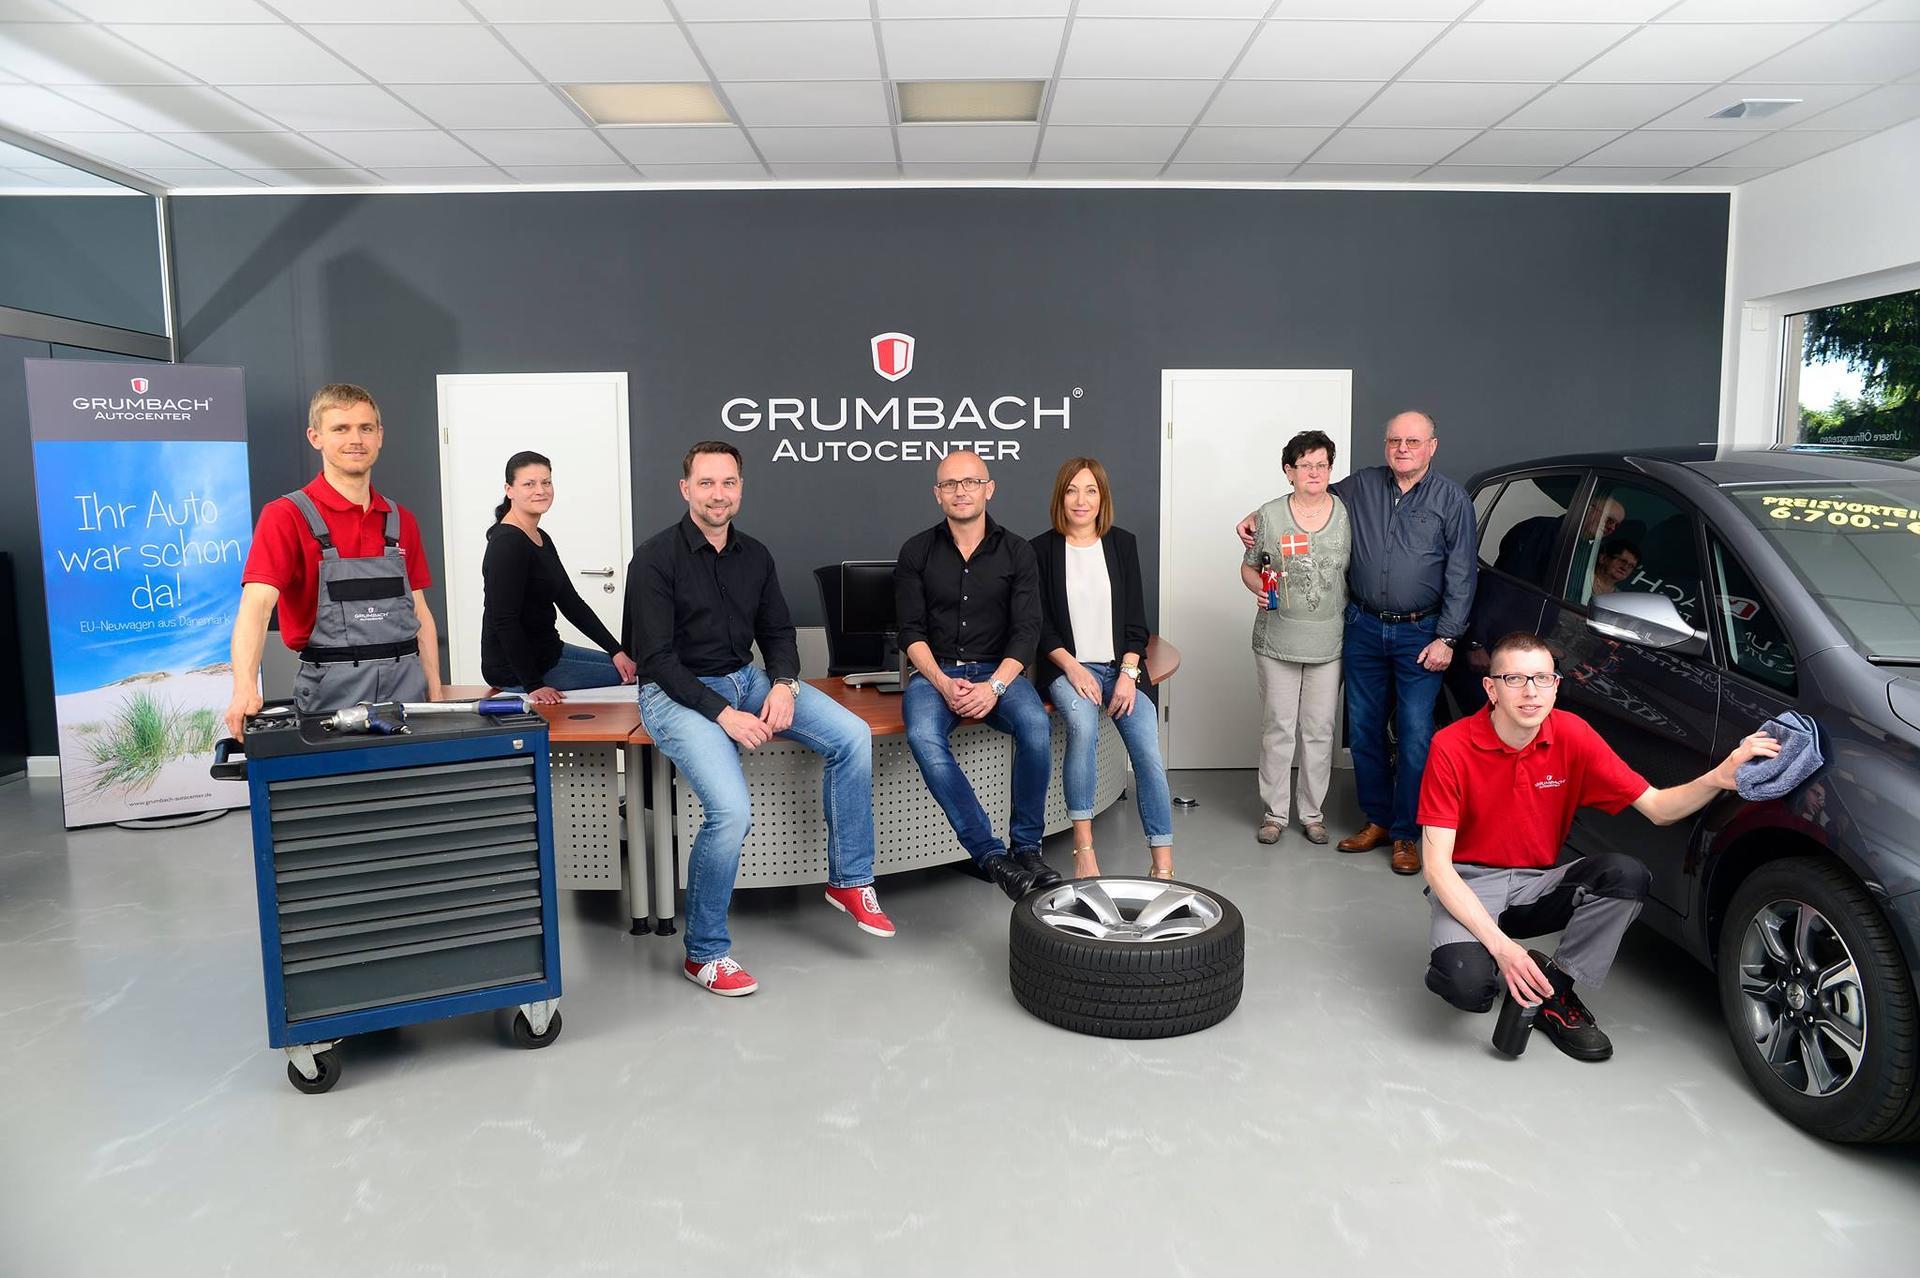 Autocenter Grumbach